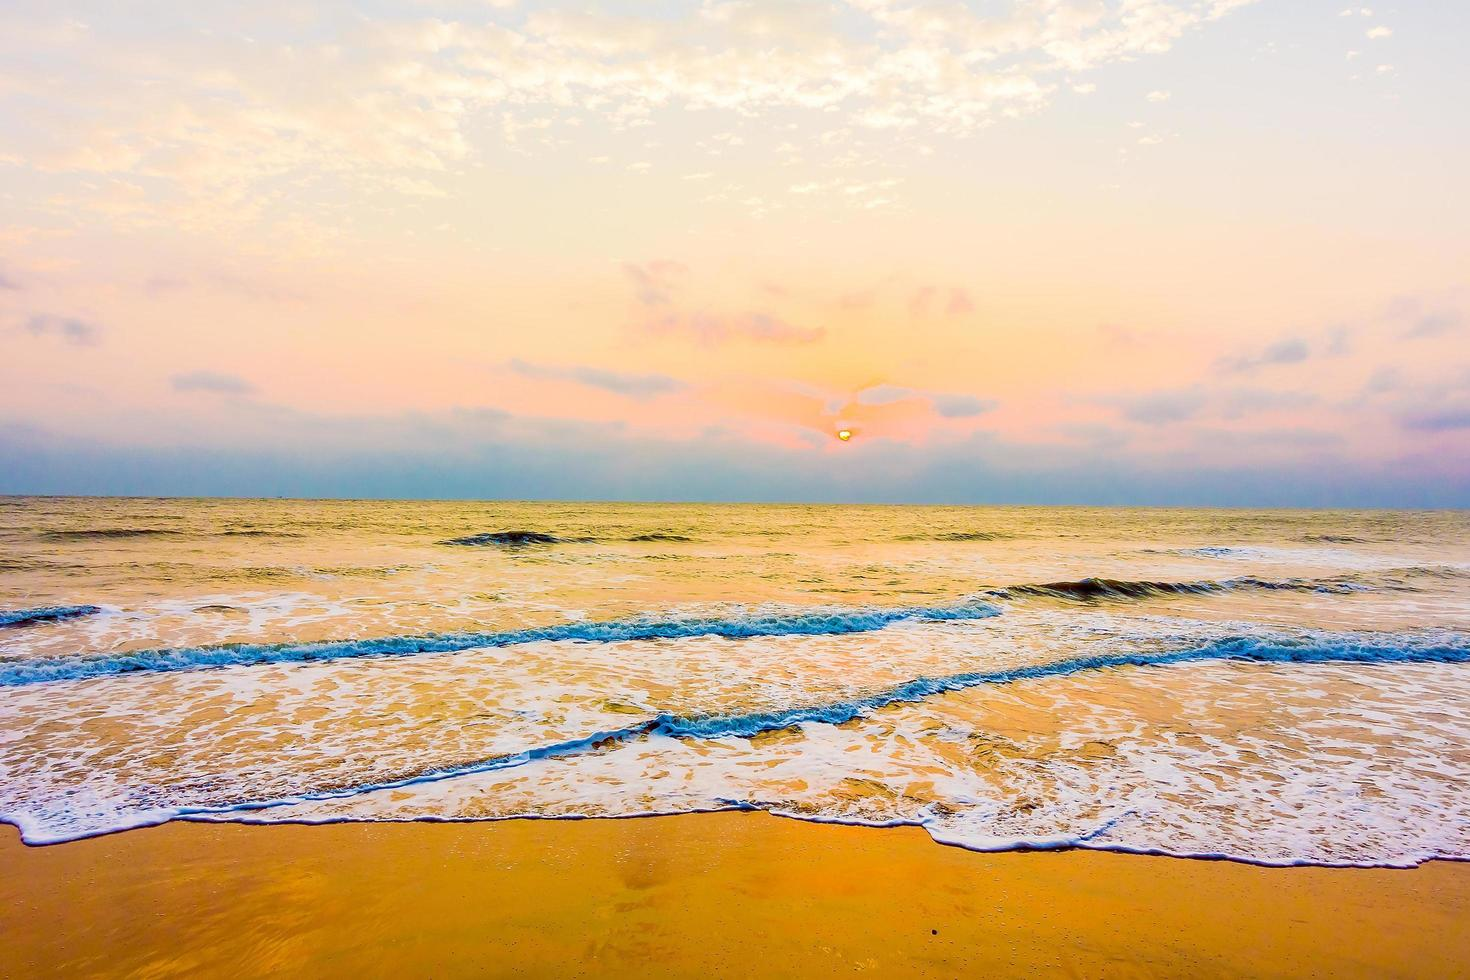 mer et plage photo